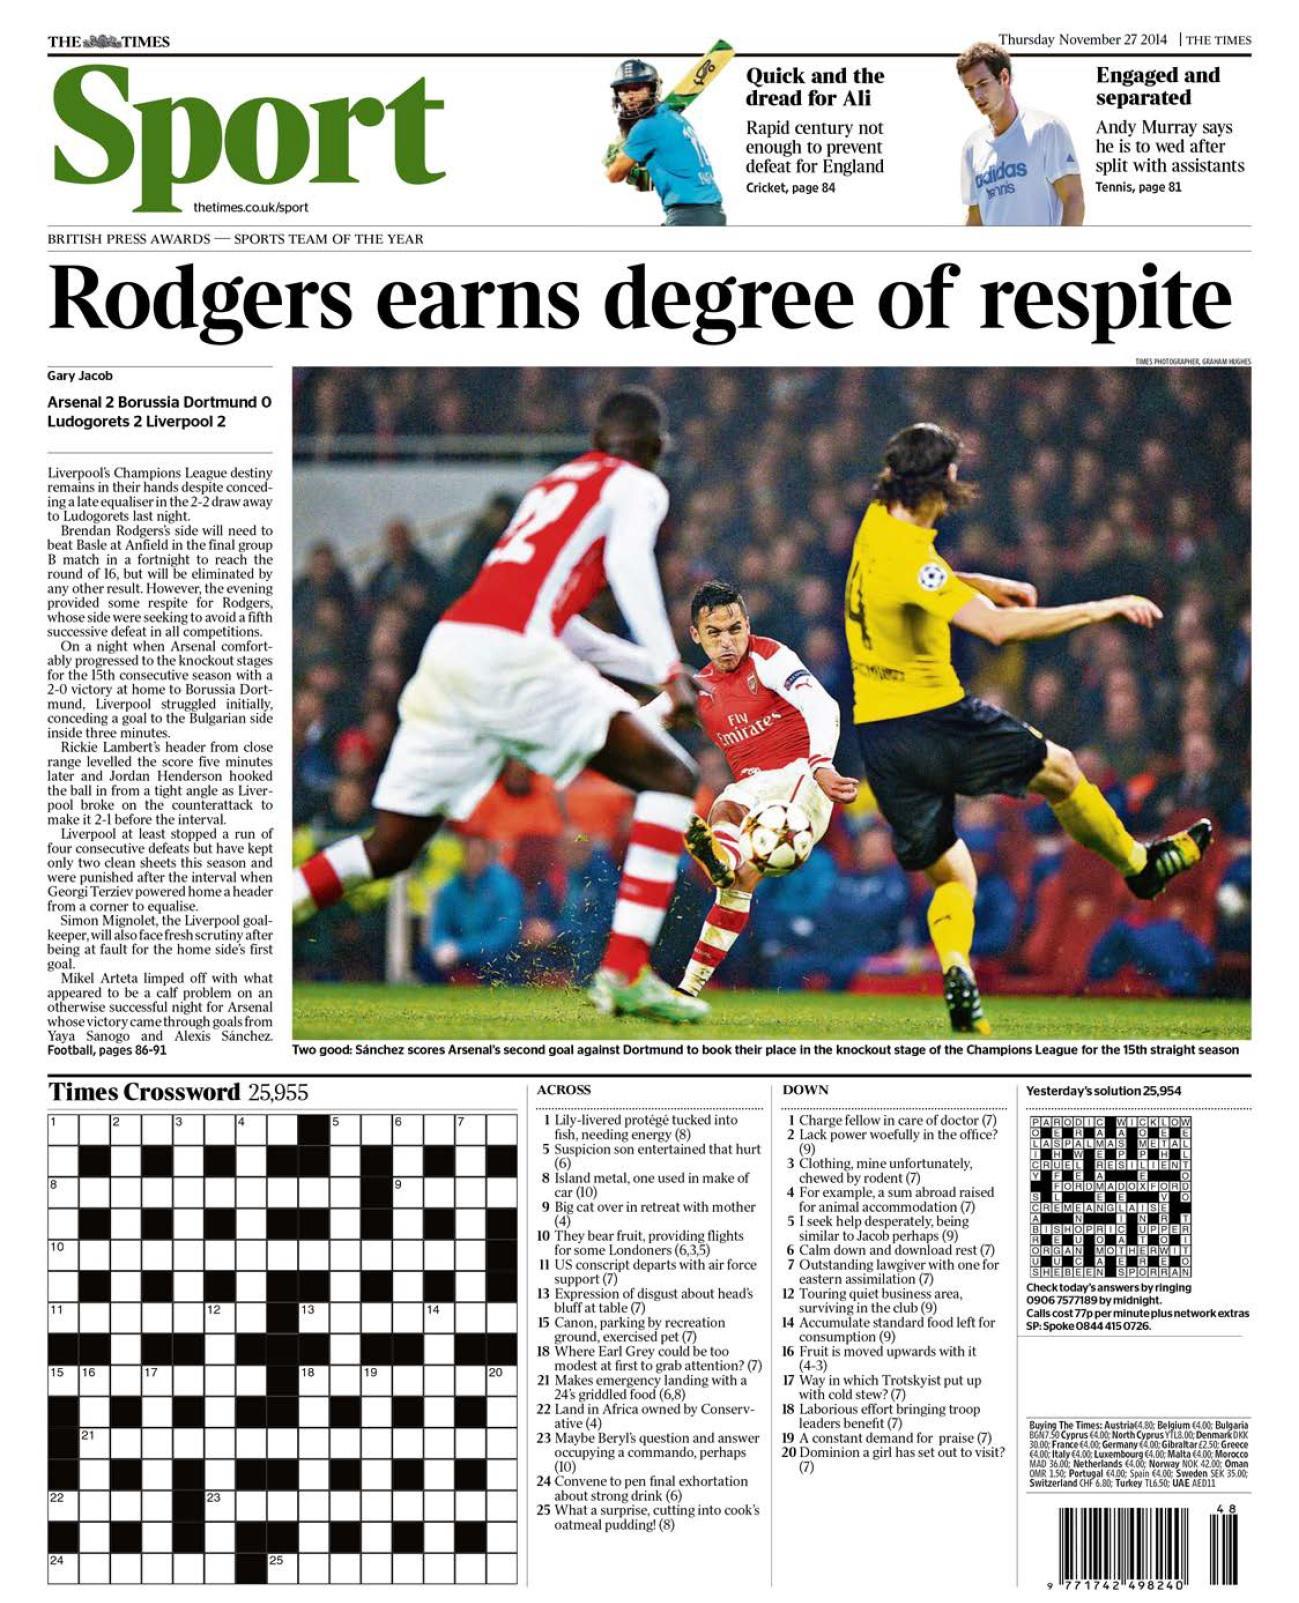 Portada de The Times del 27 de Noviembre